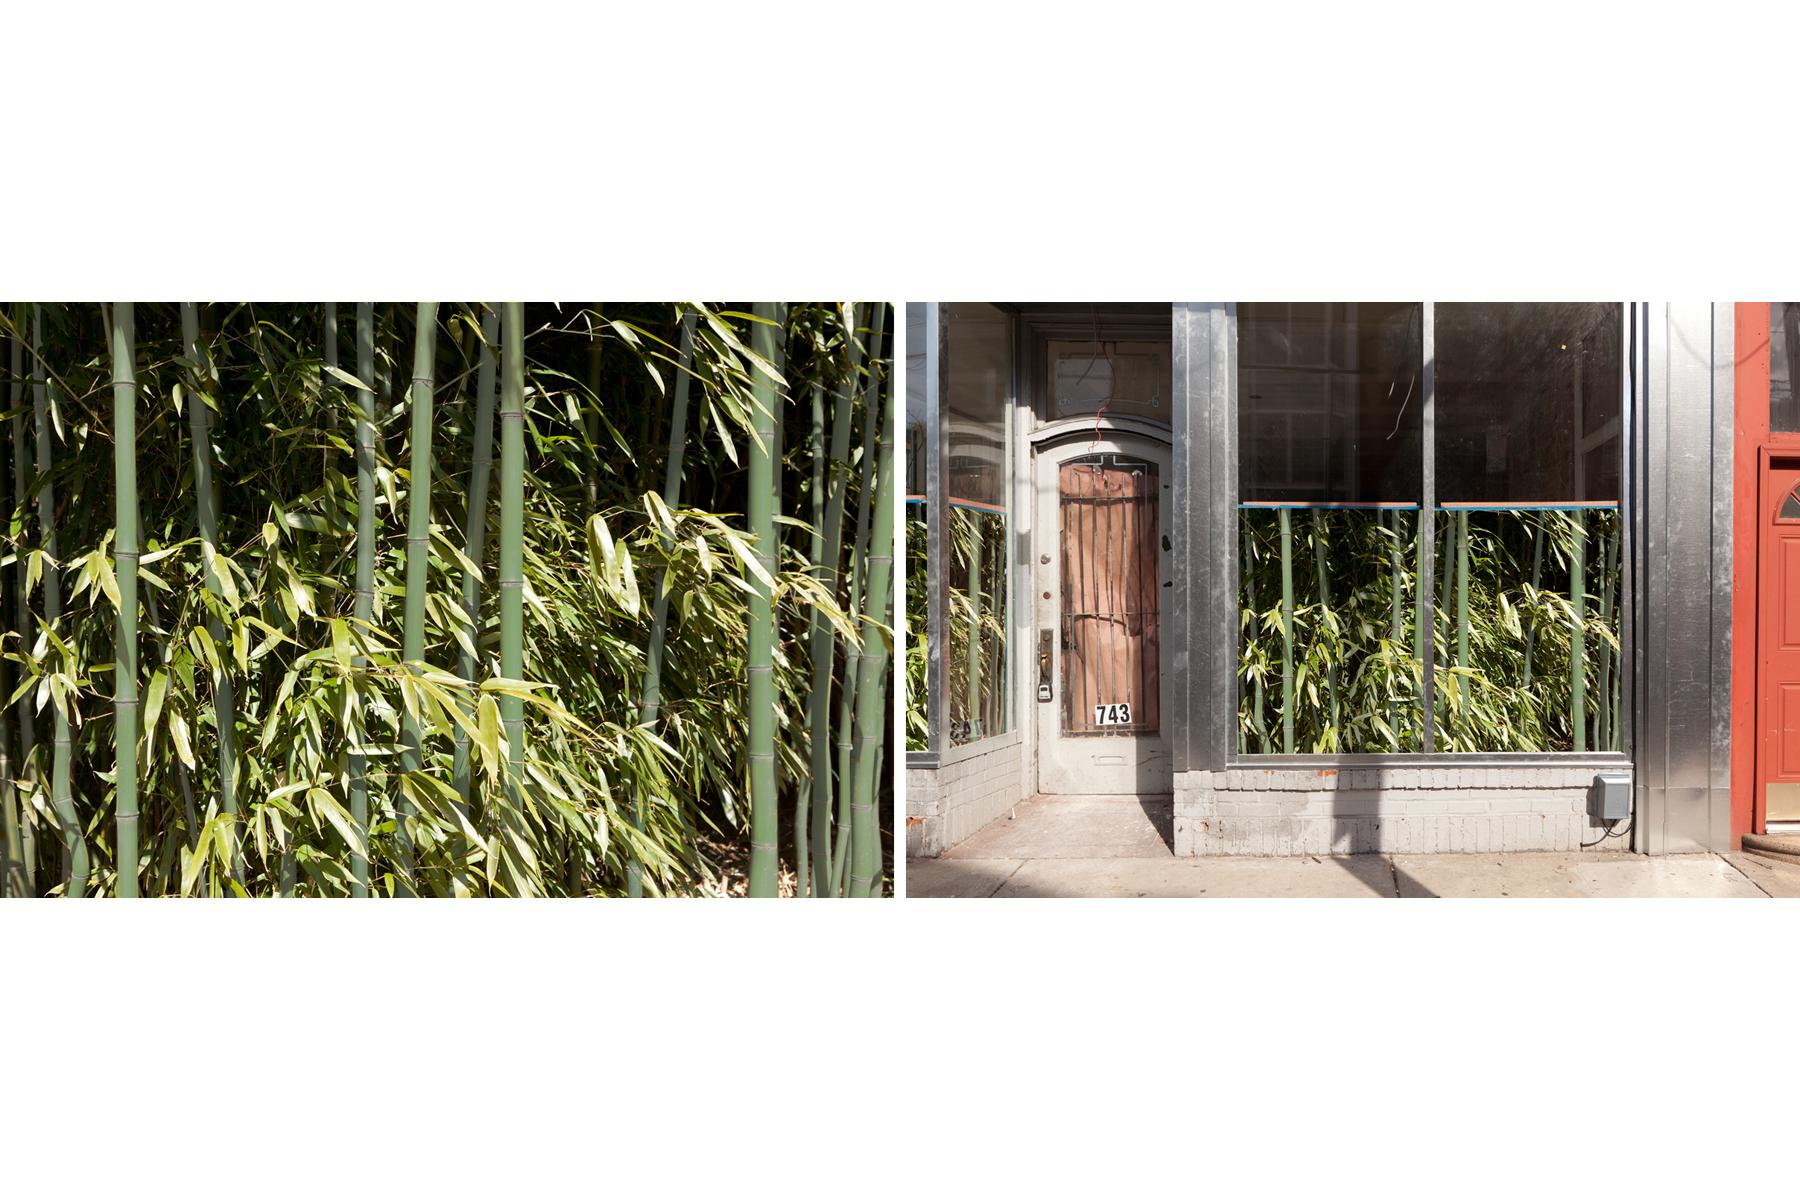 Bamboo, 2017, archival pigment print